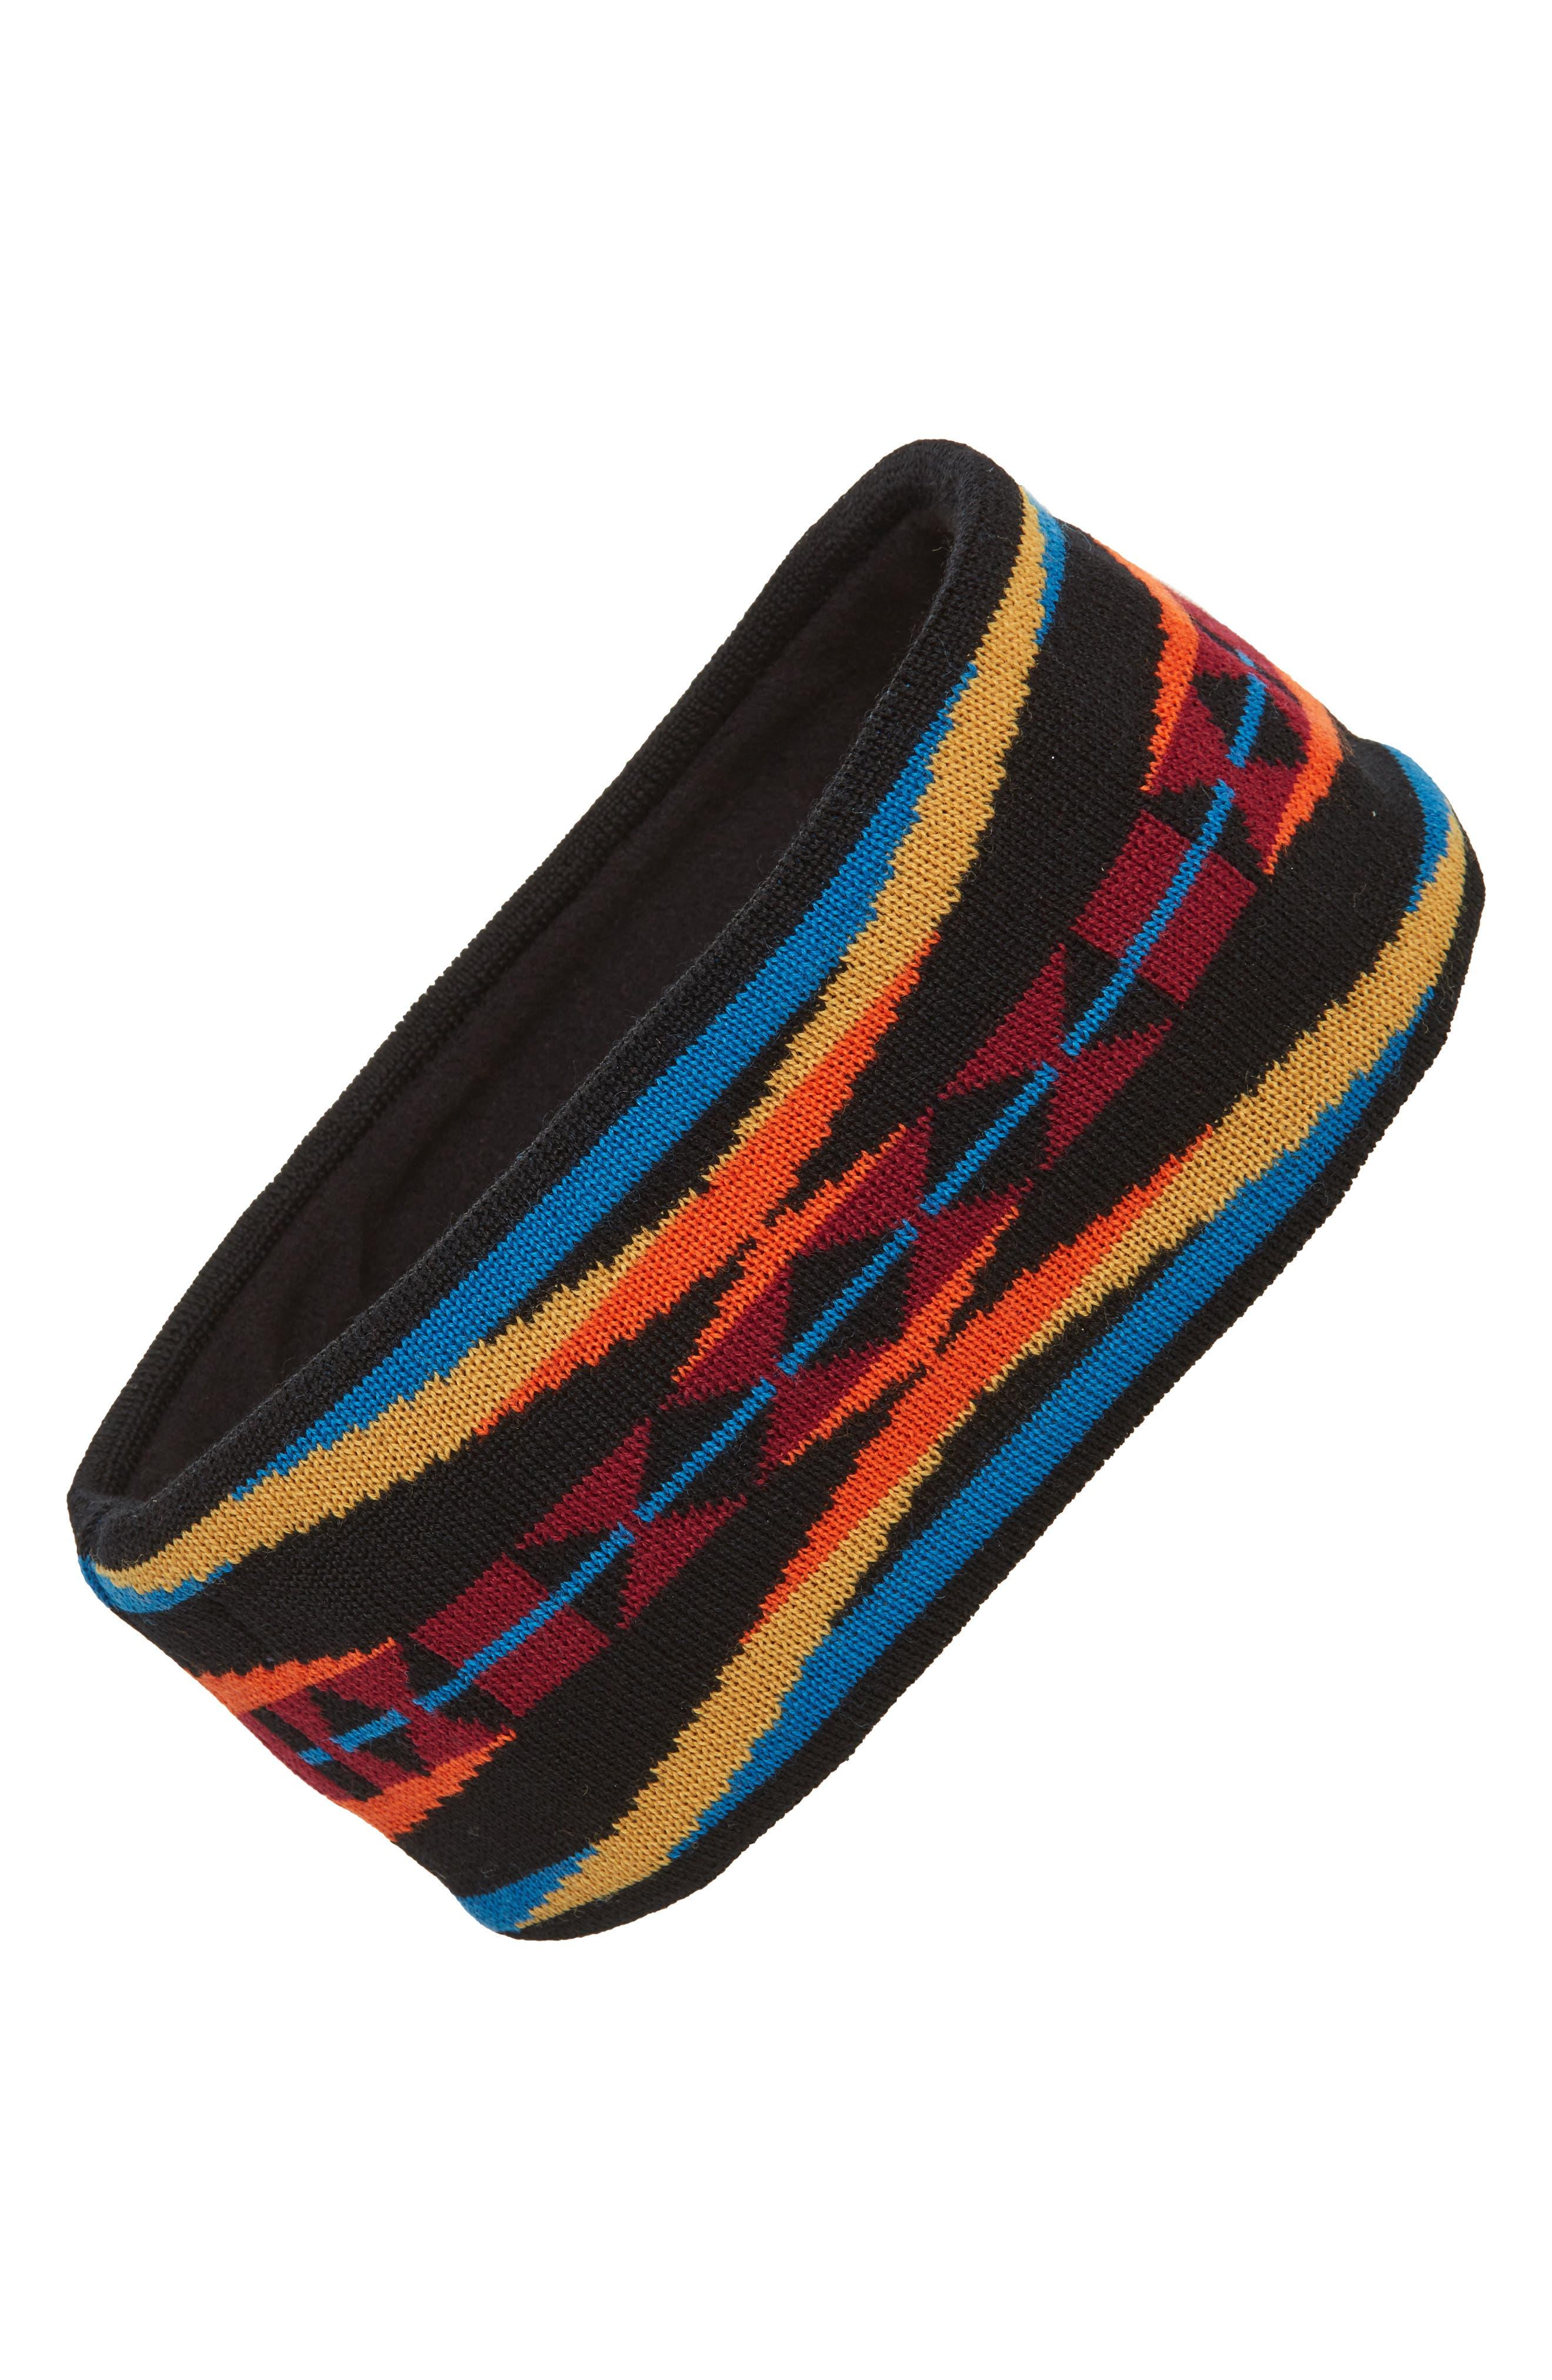 Fleece Lined Headband,                         Main,                         color, La Paz Black